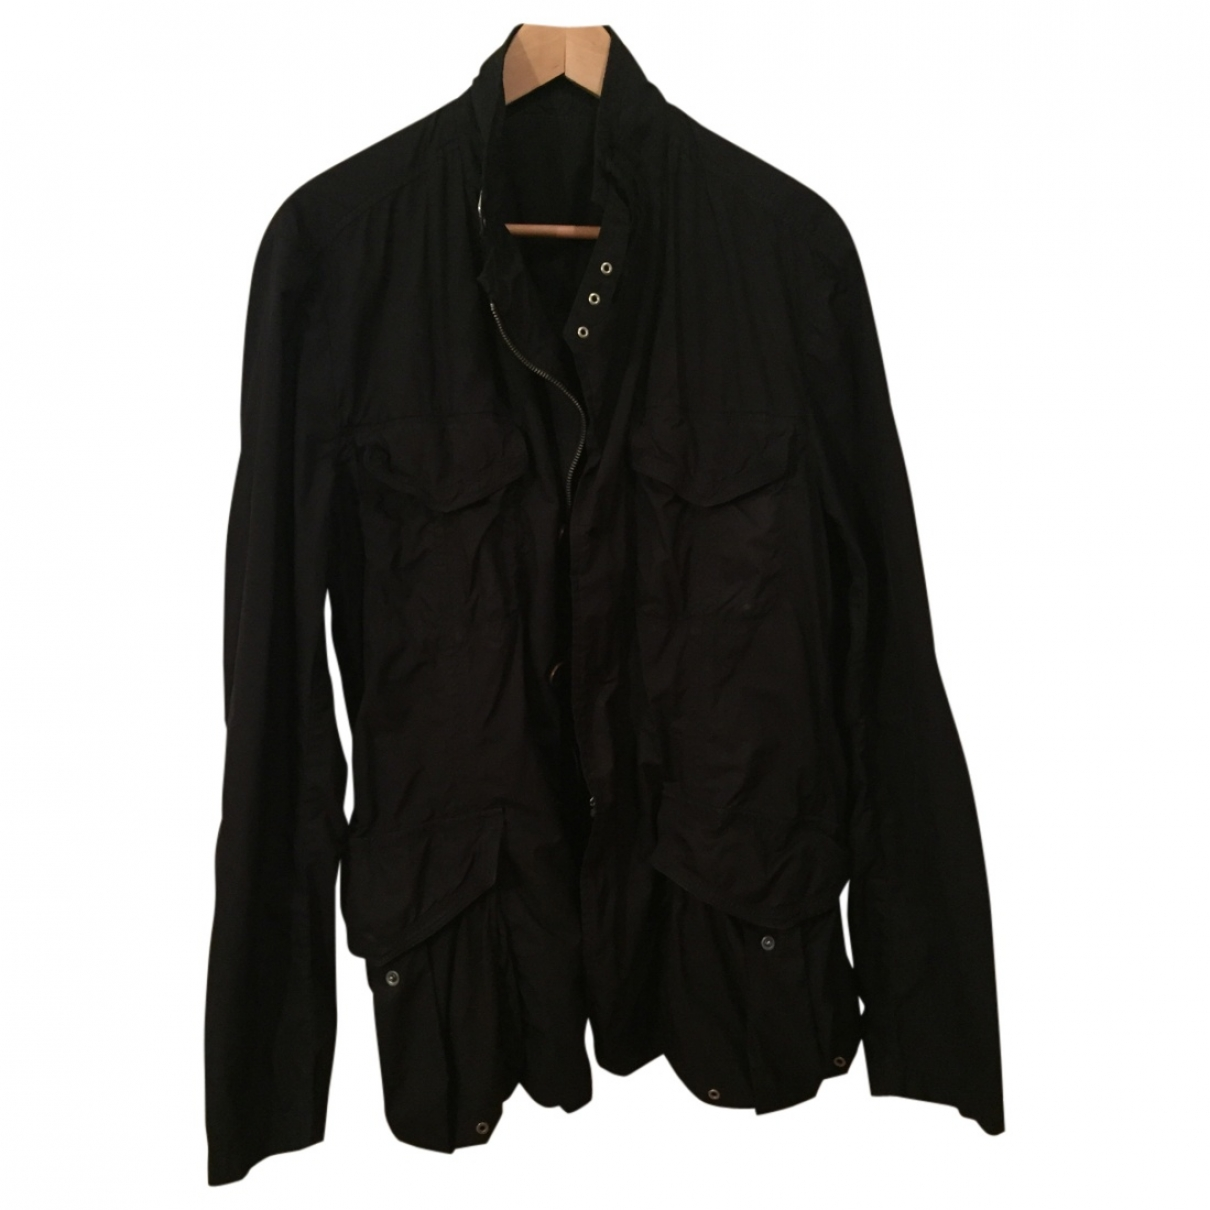 Moncler \N Jacke in  Schwarz Polyester